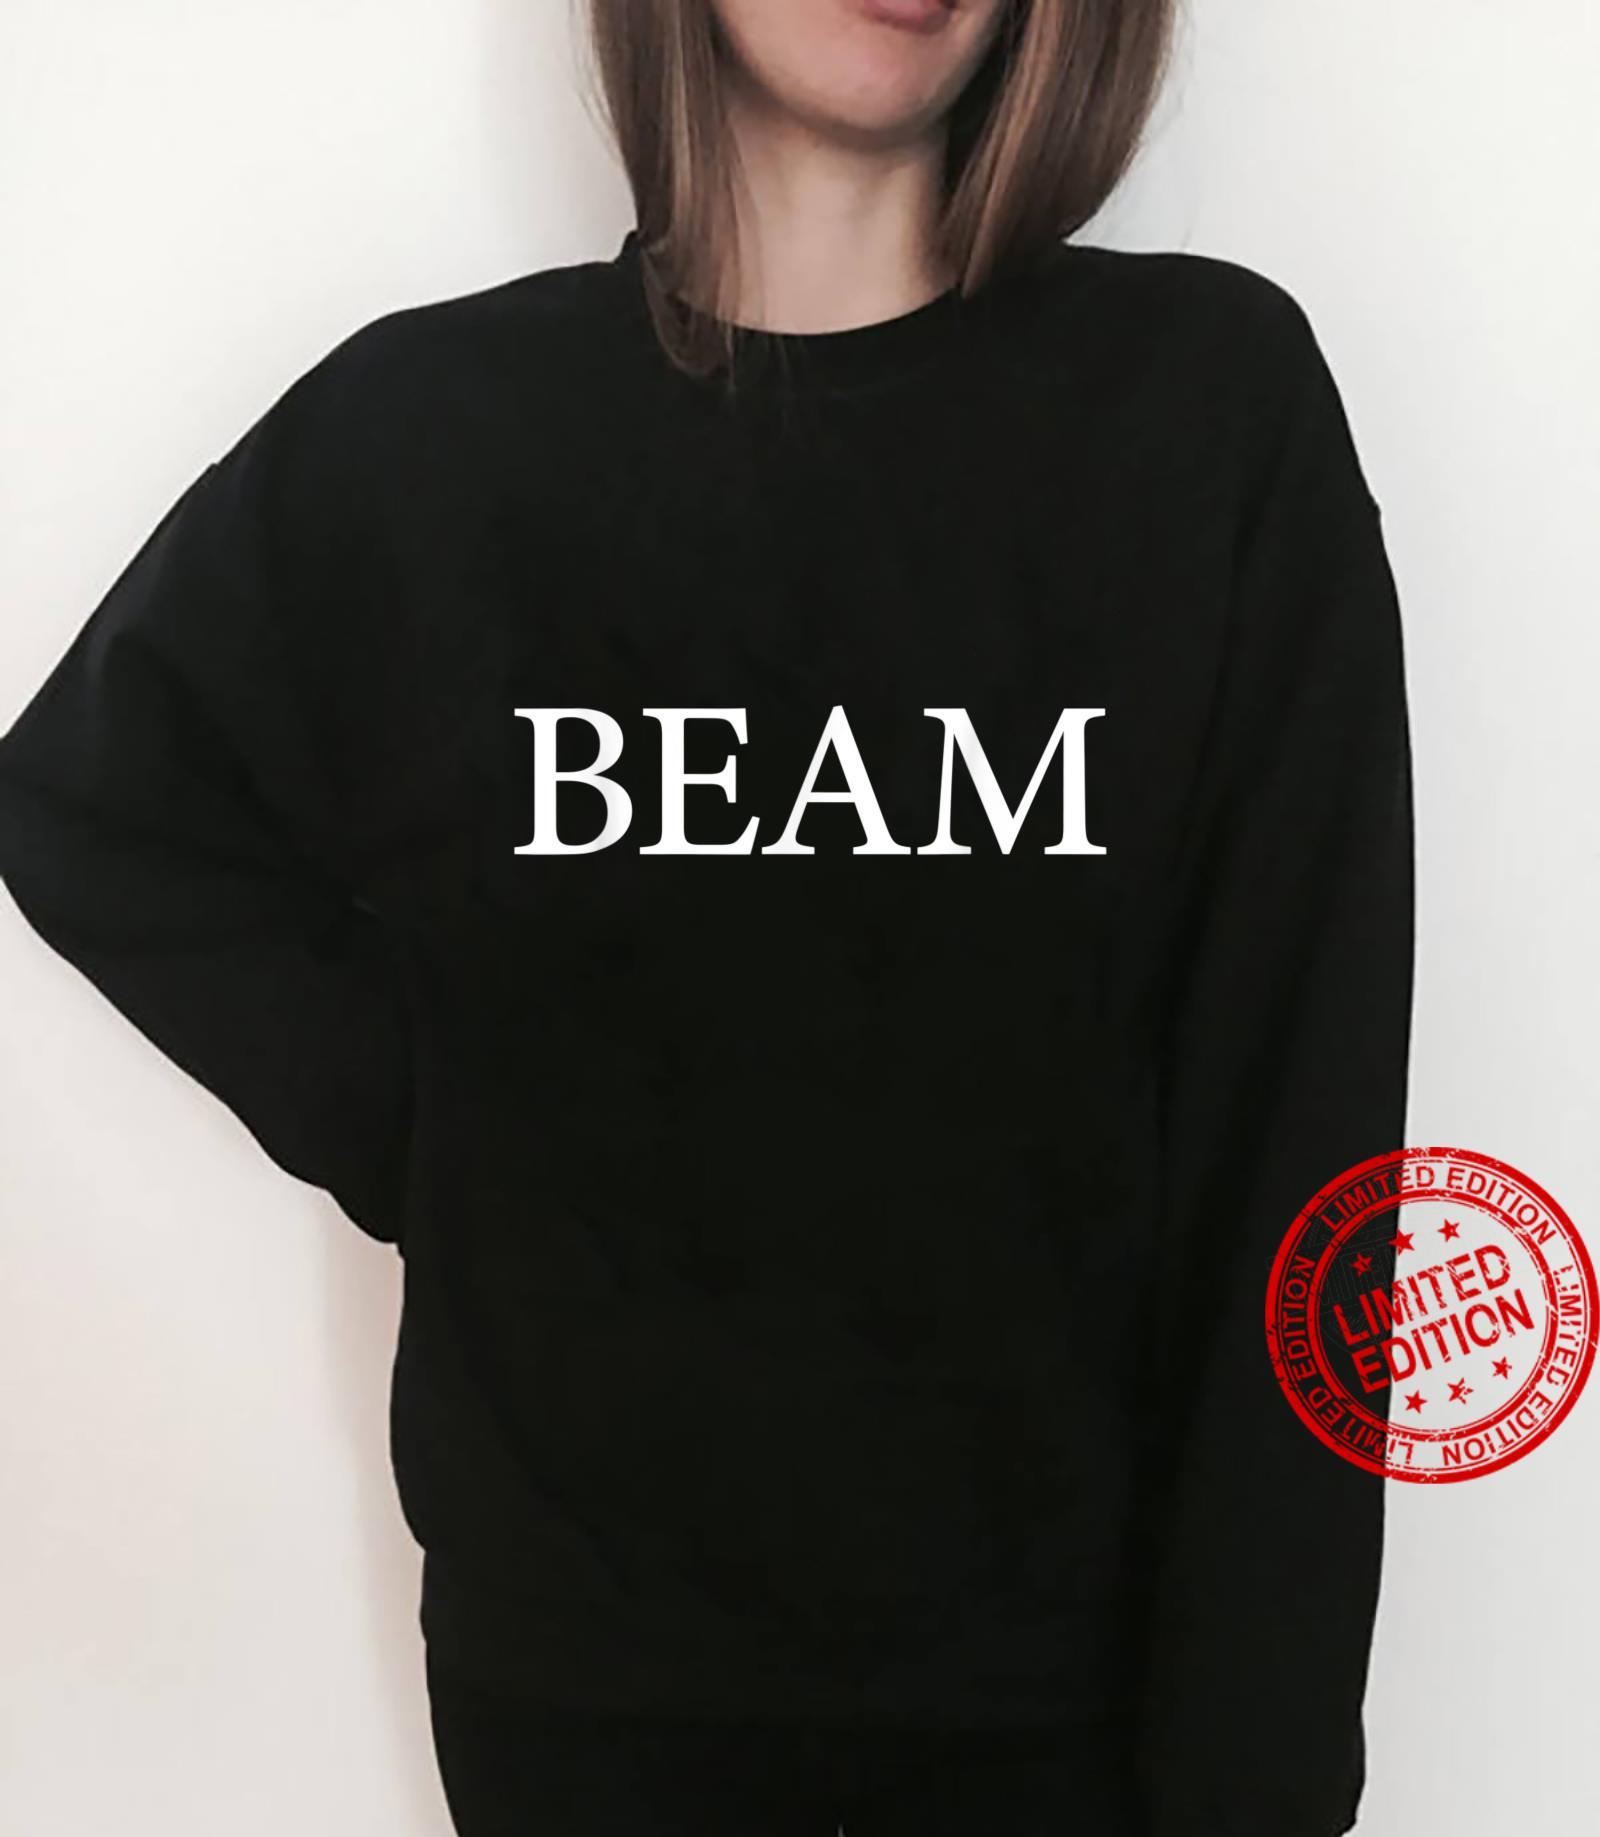 Beam Name Family Vintage Retro Shirt sweater